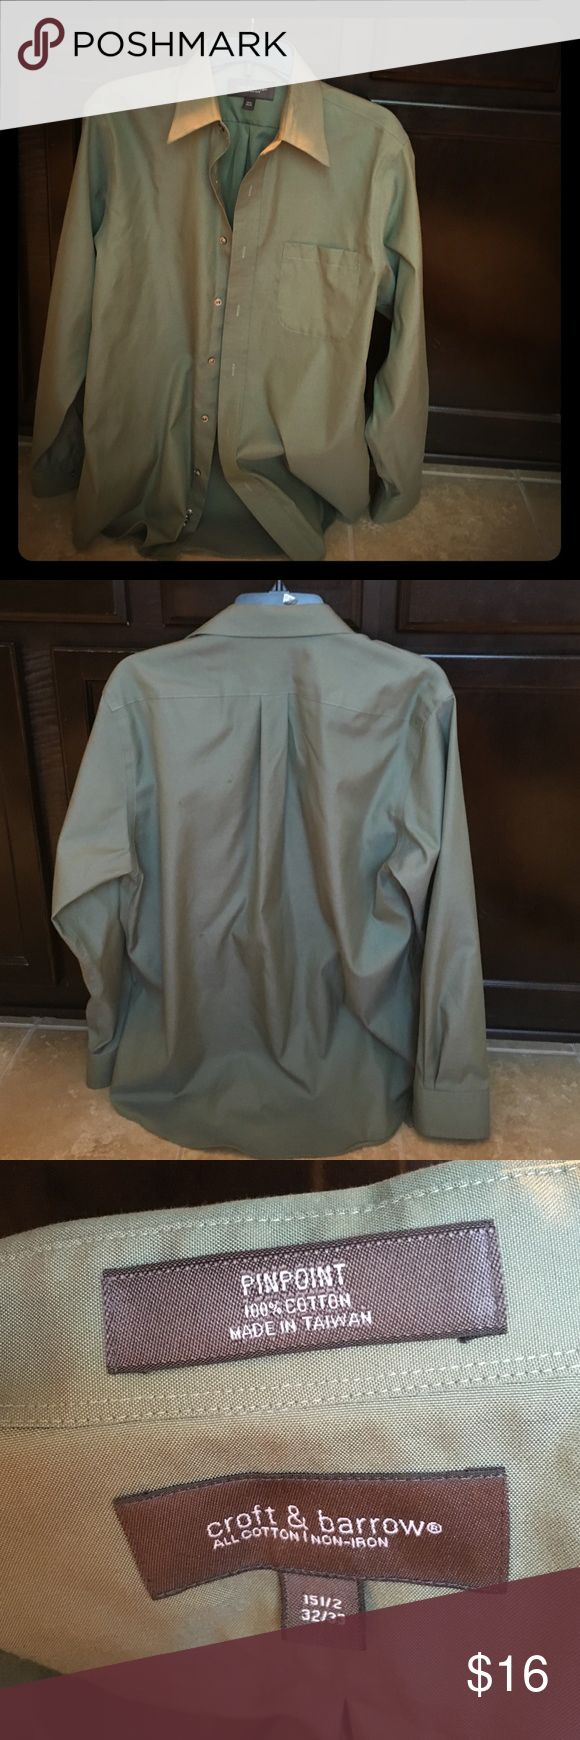 Men's Hunter Green Croft and Barrow dress shirt. Men's hunter green dress shirt from Croft and Barrow 15/half neck, 32-33 sleeves croft & barrow Shirts Dress Shirts